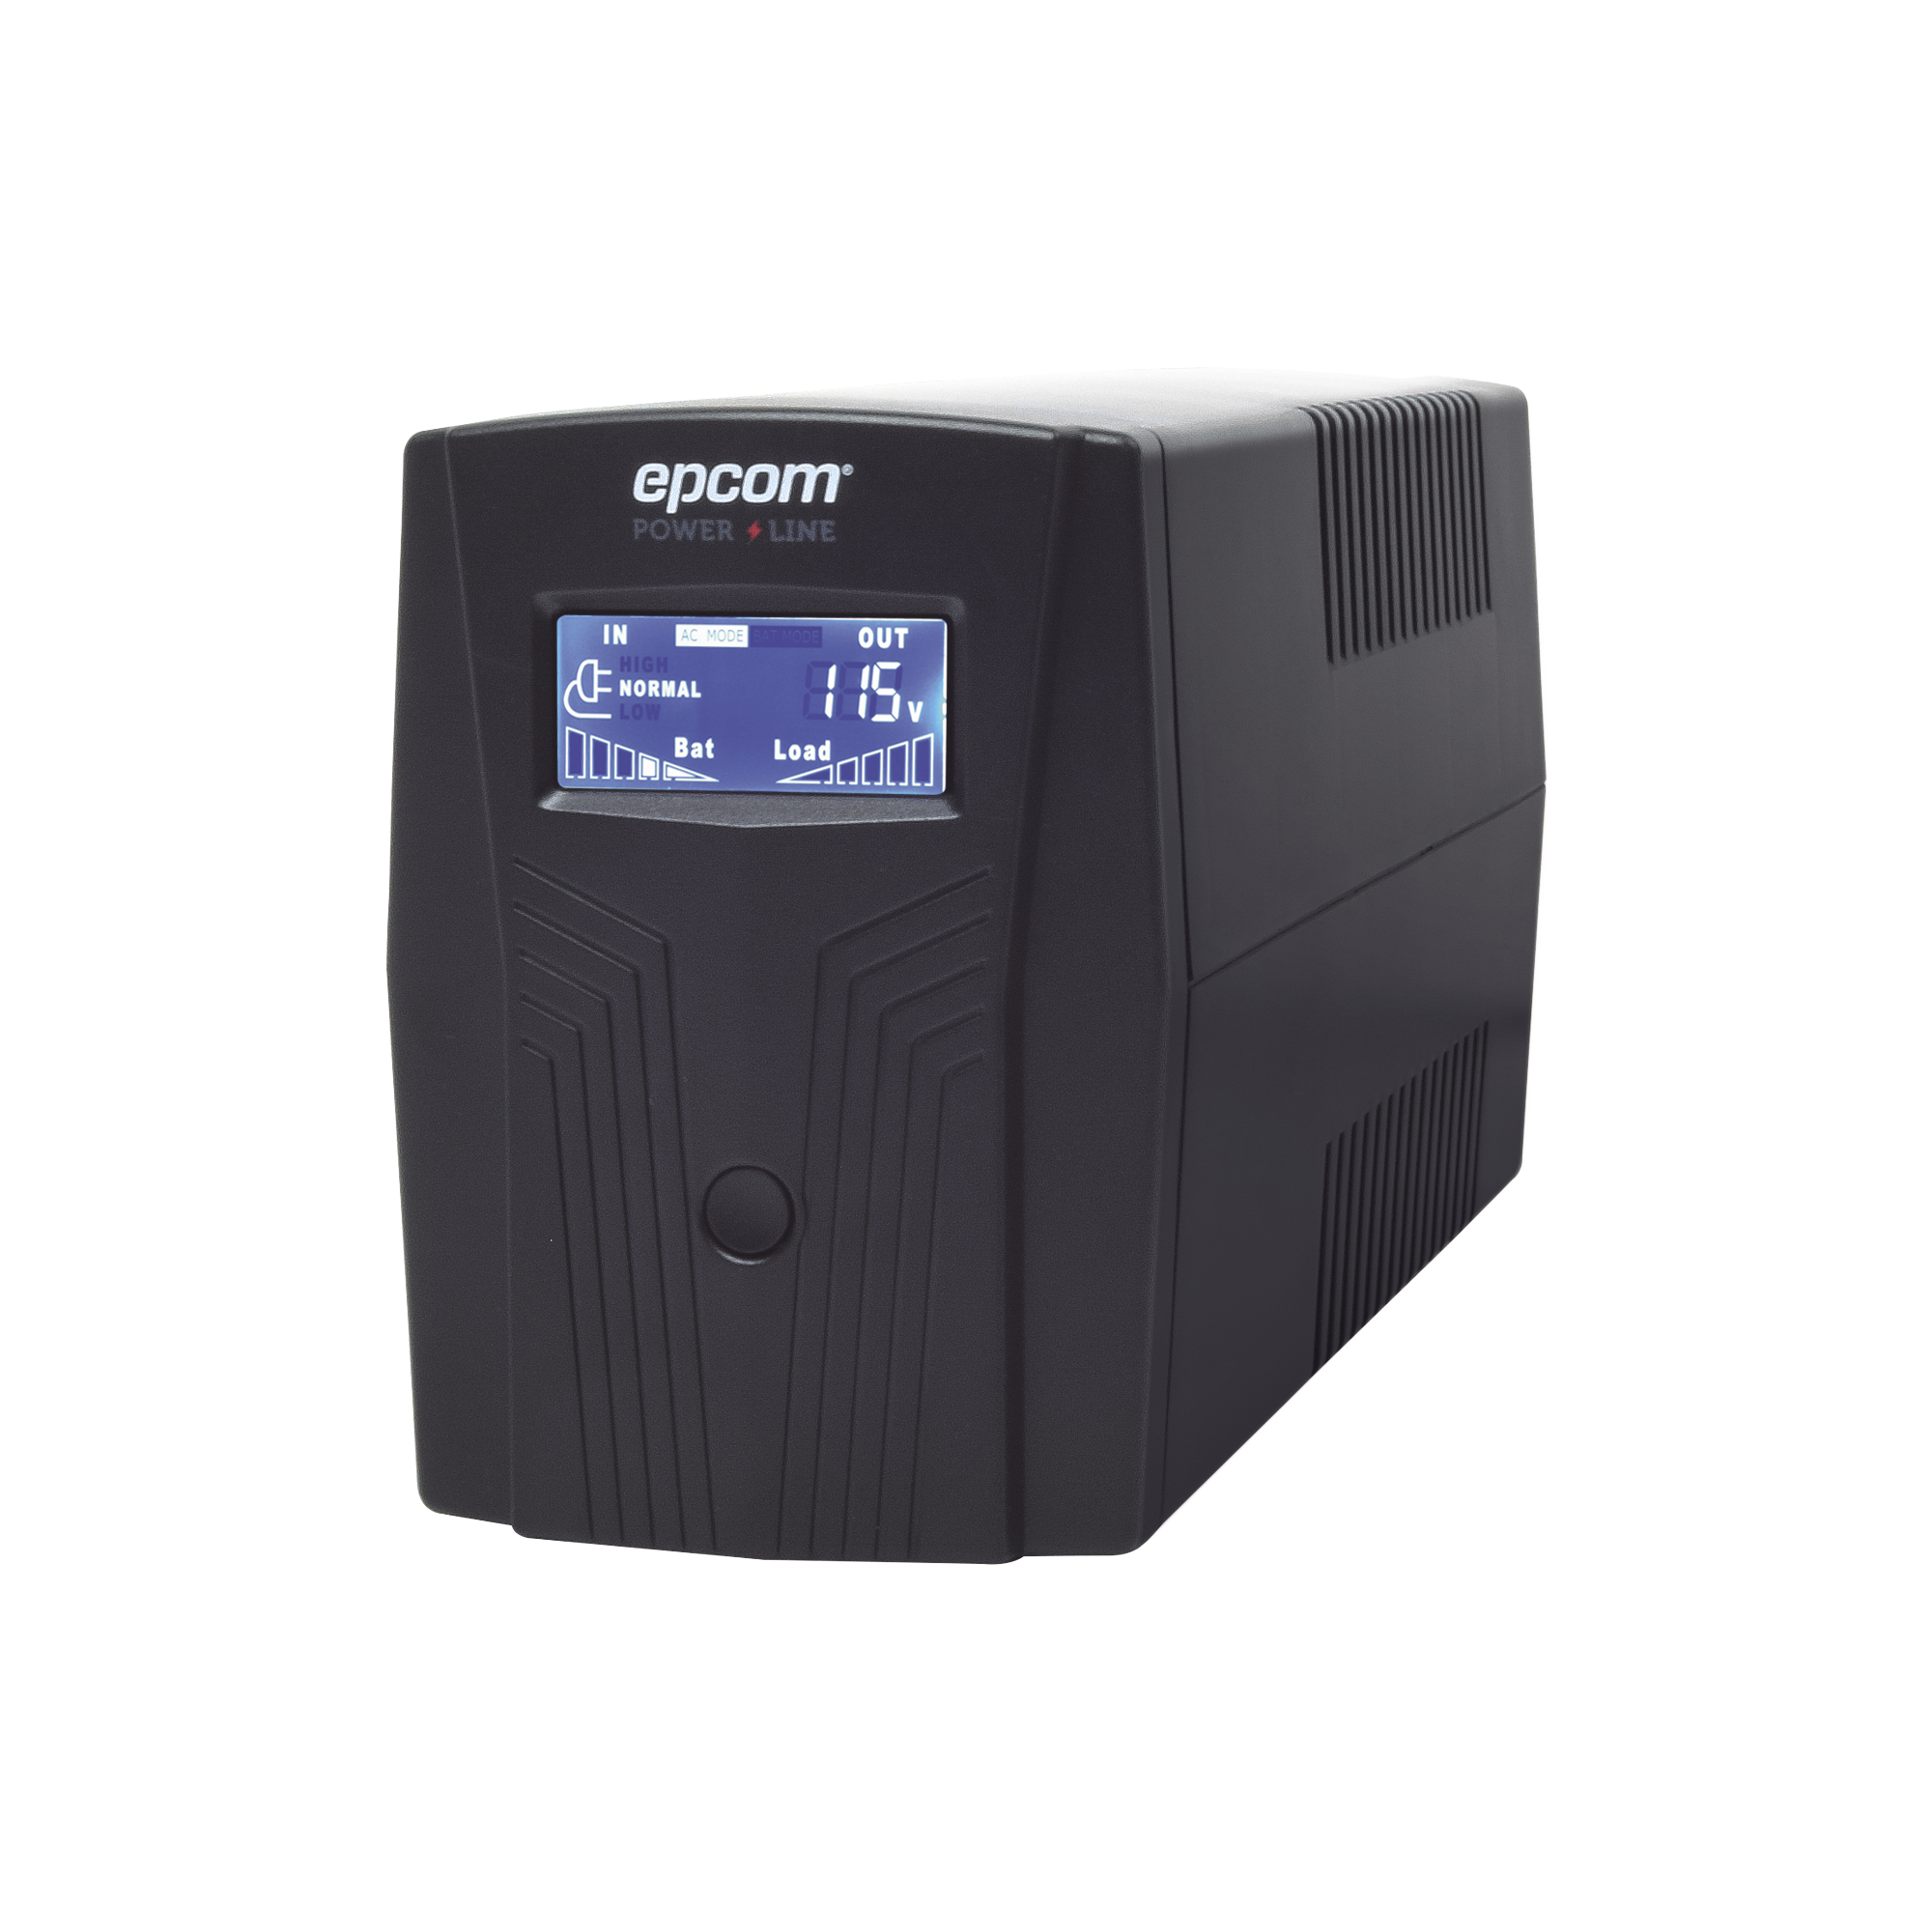 UPS de 850VA/510W / Topologia Linea Interactiva / Entrada y Salida 120 Vca / Regulador de Voltaje AVR 80-150 Vca / Clavija NEMA 5-15P / 6 Tomas NEMA 5-15R